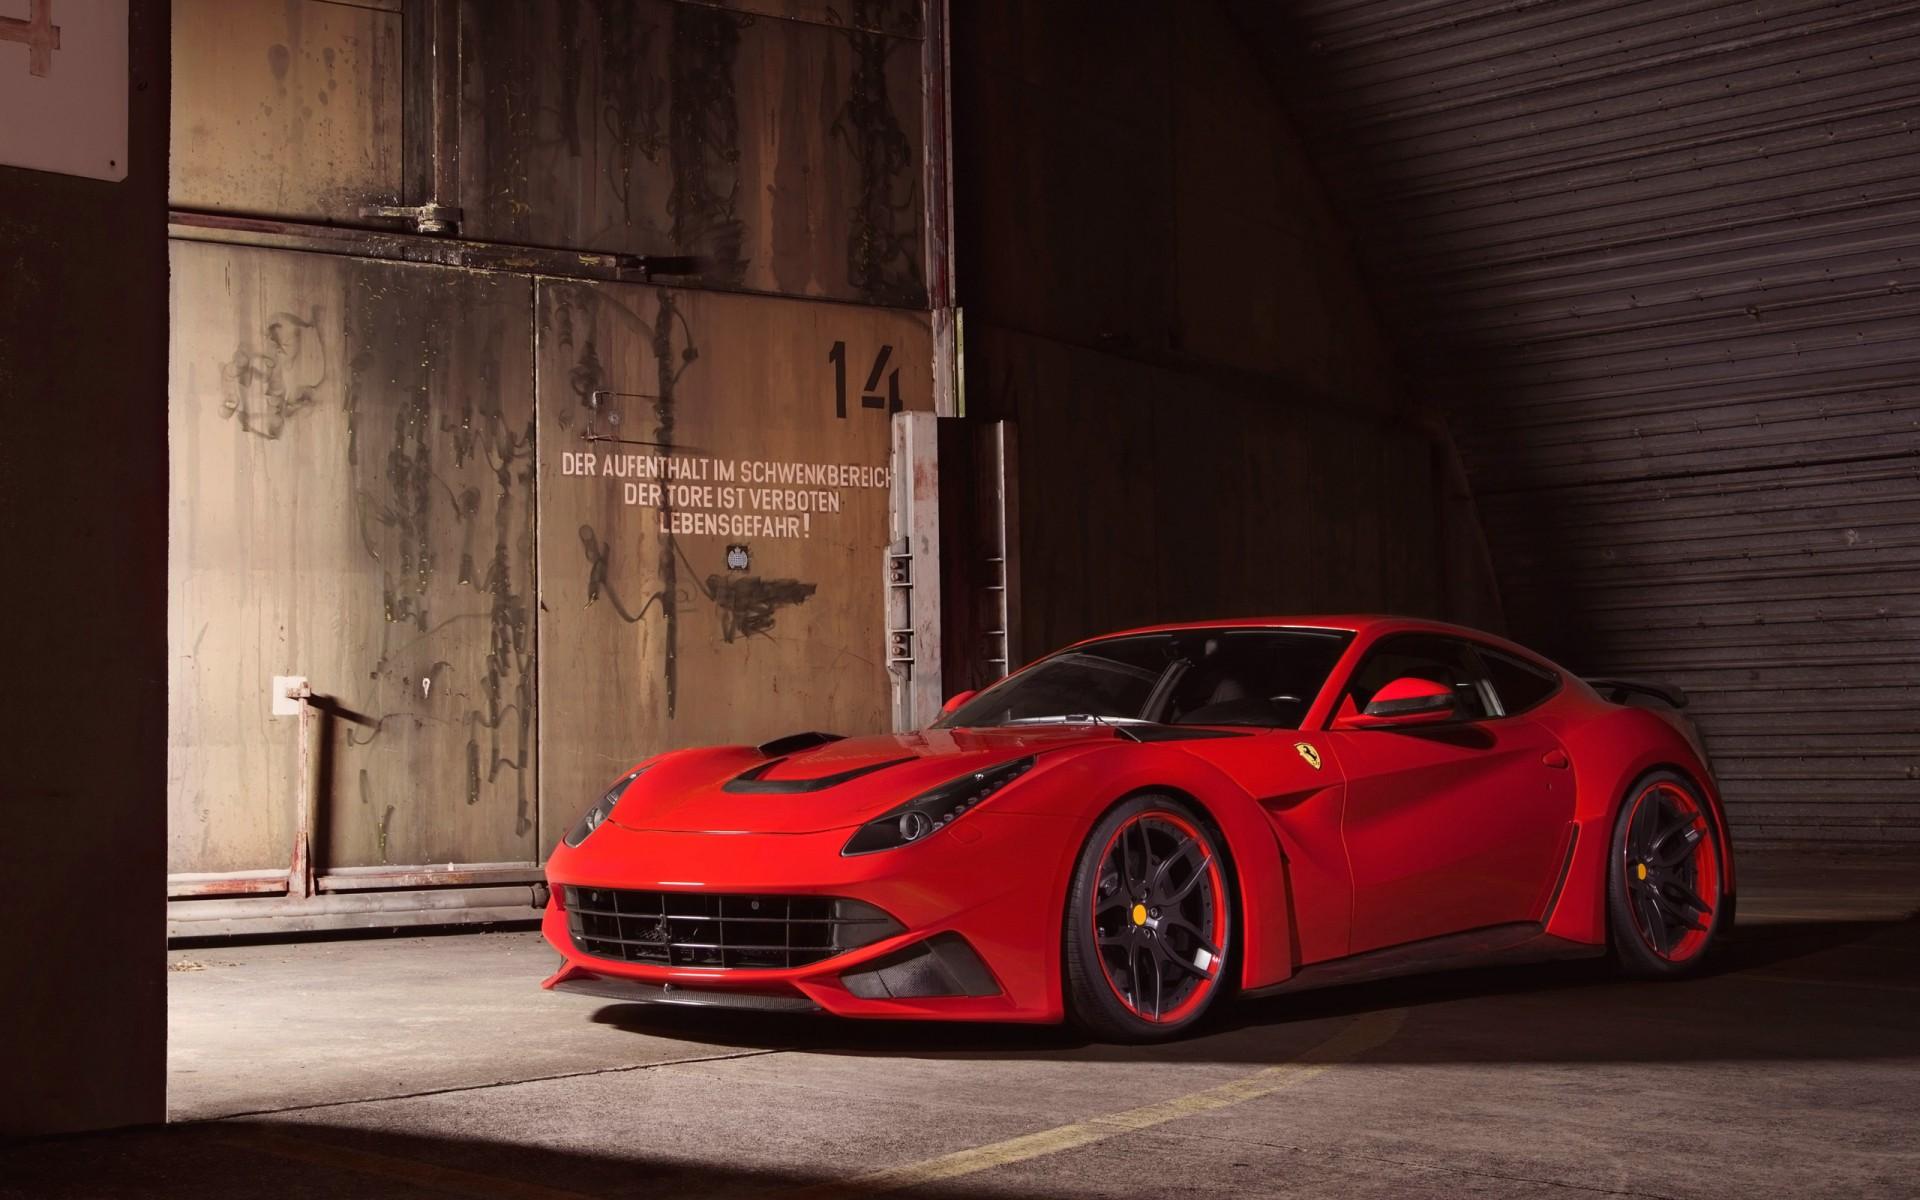 Картинки Ferrari, 2014, Novitec, Rosso, berlinetta, LARGO фото и обои на рабочий стол